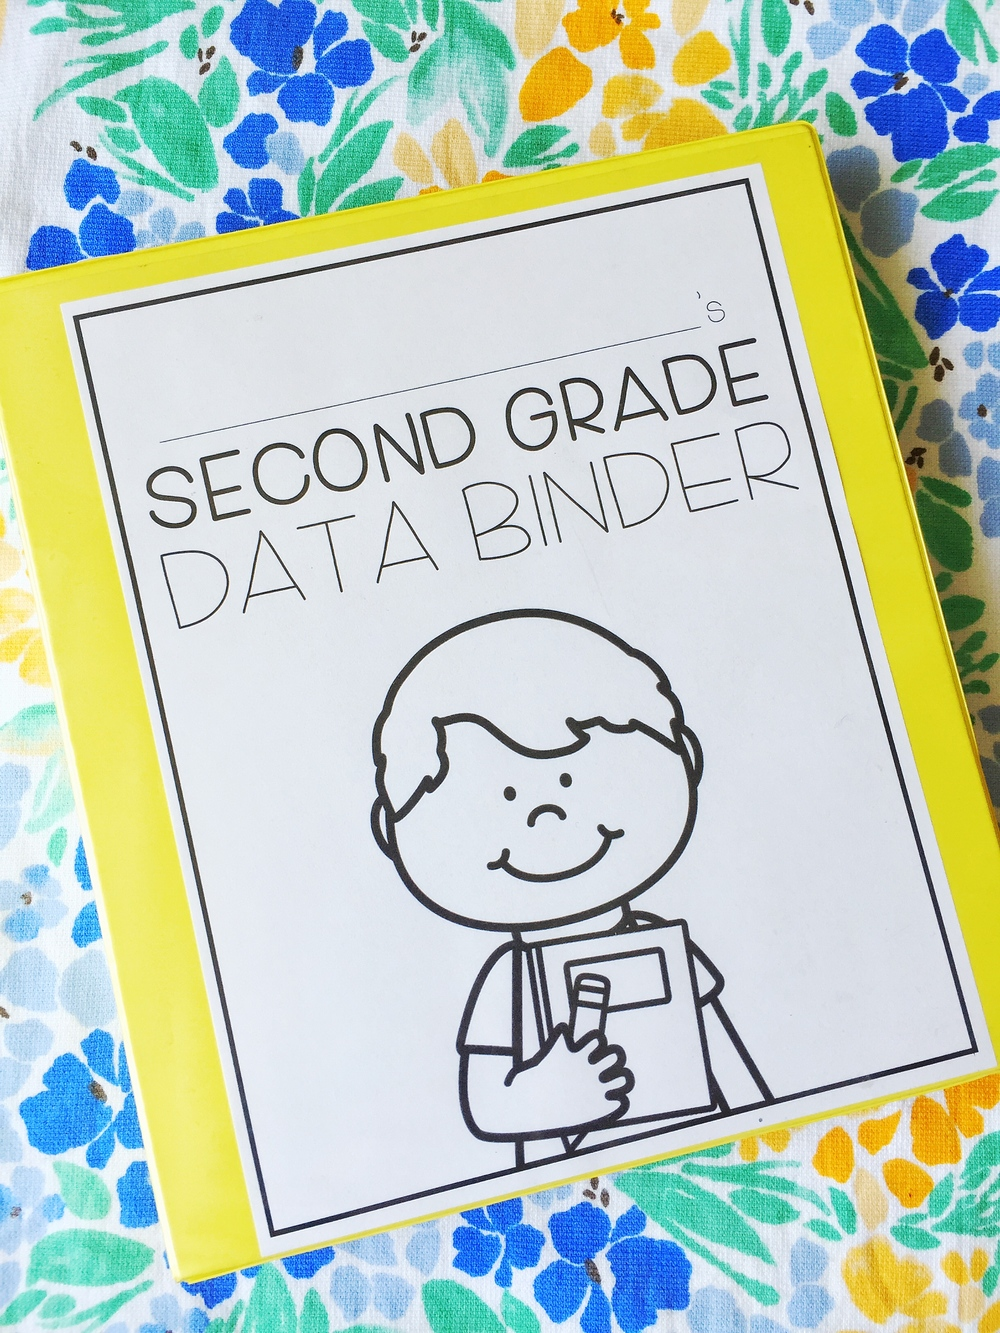 data_binder